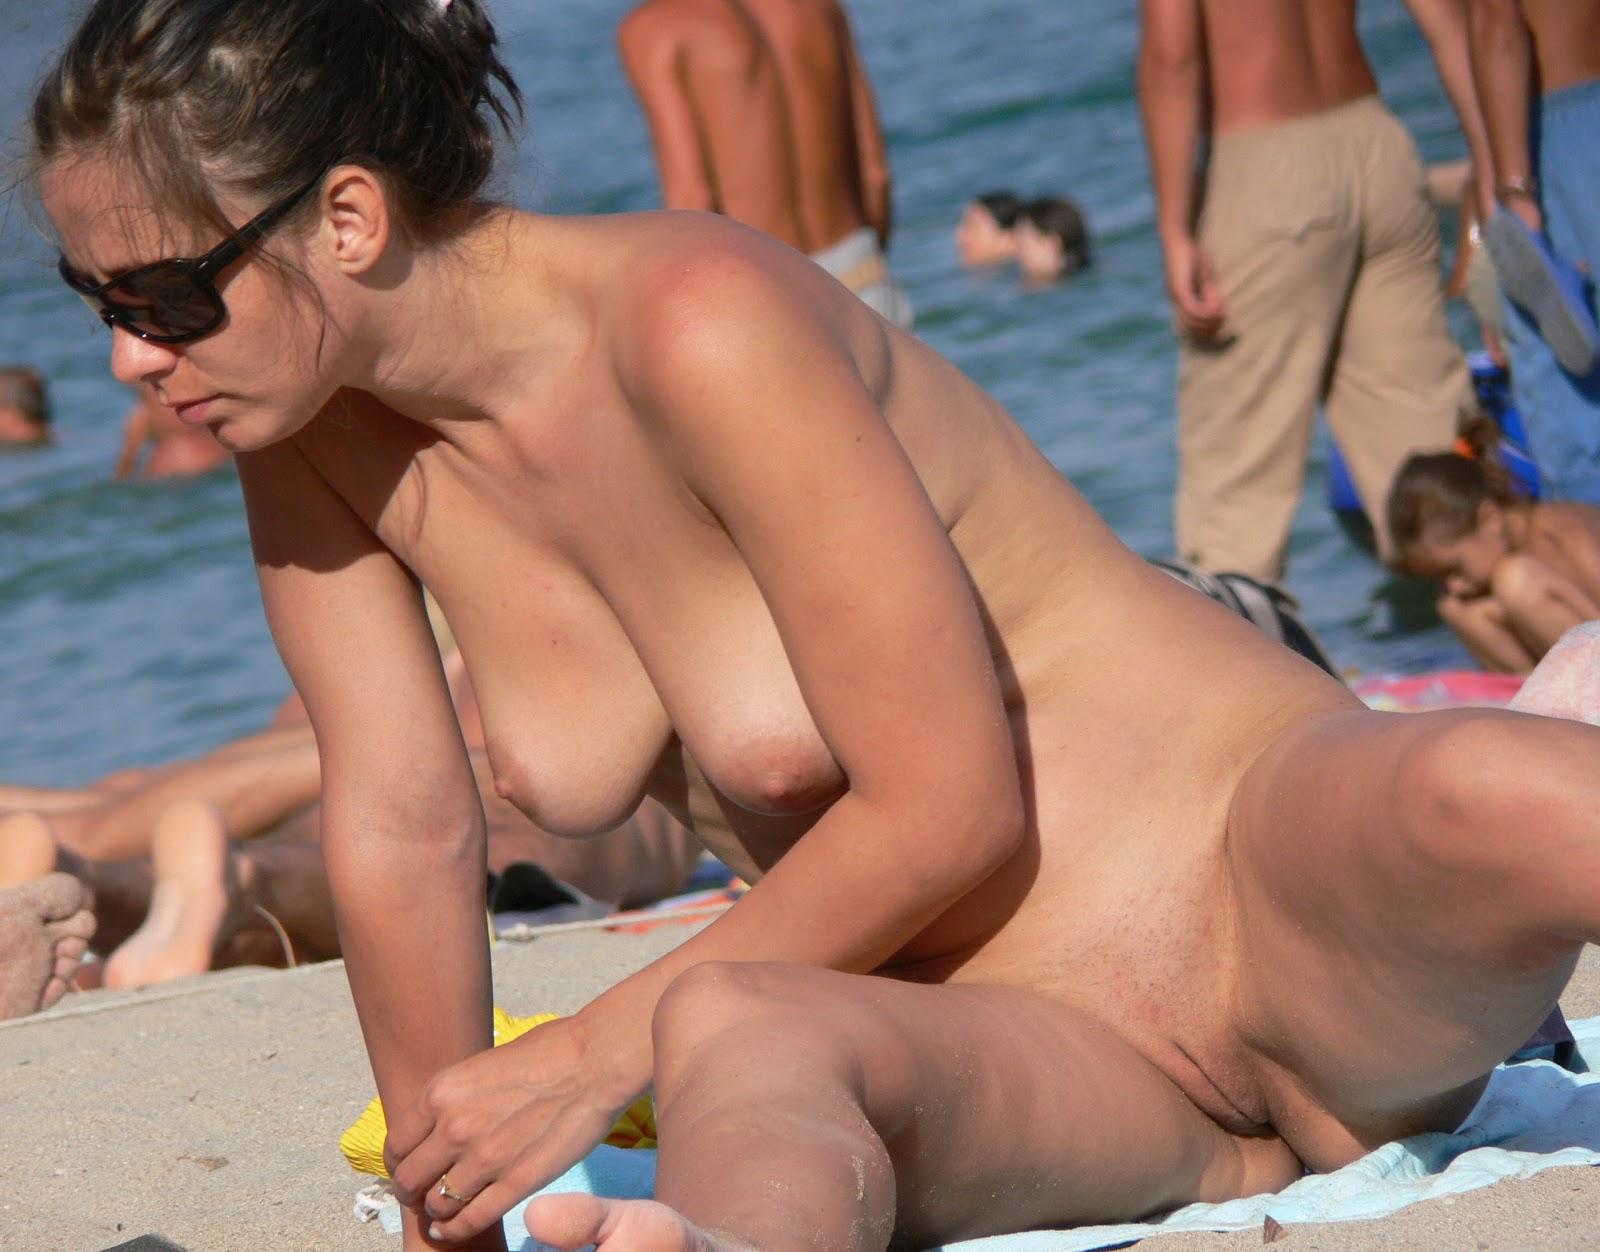 Candid Nude Beach Pussy Voyeur